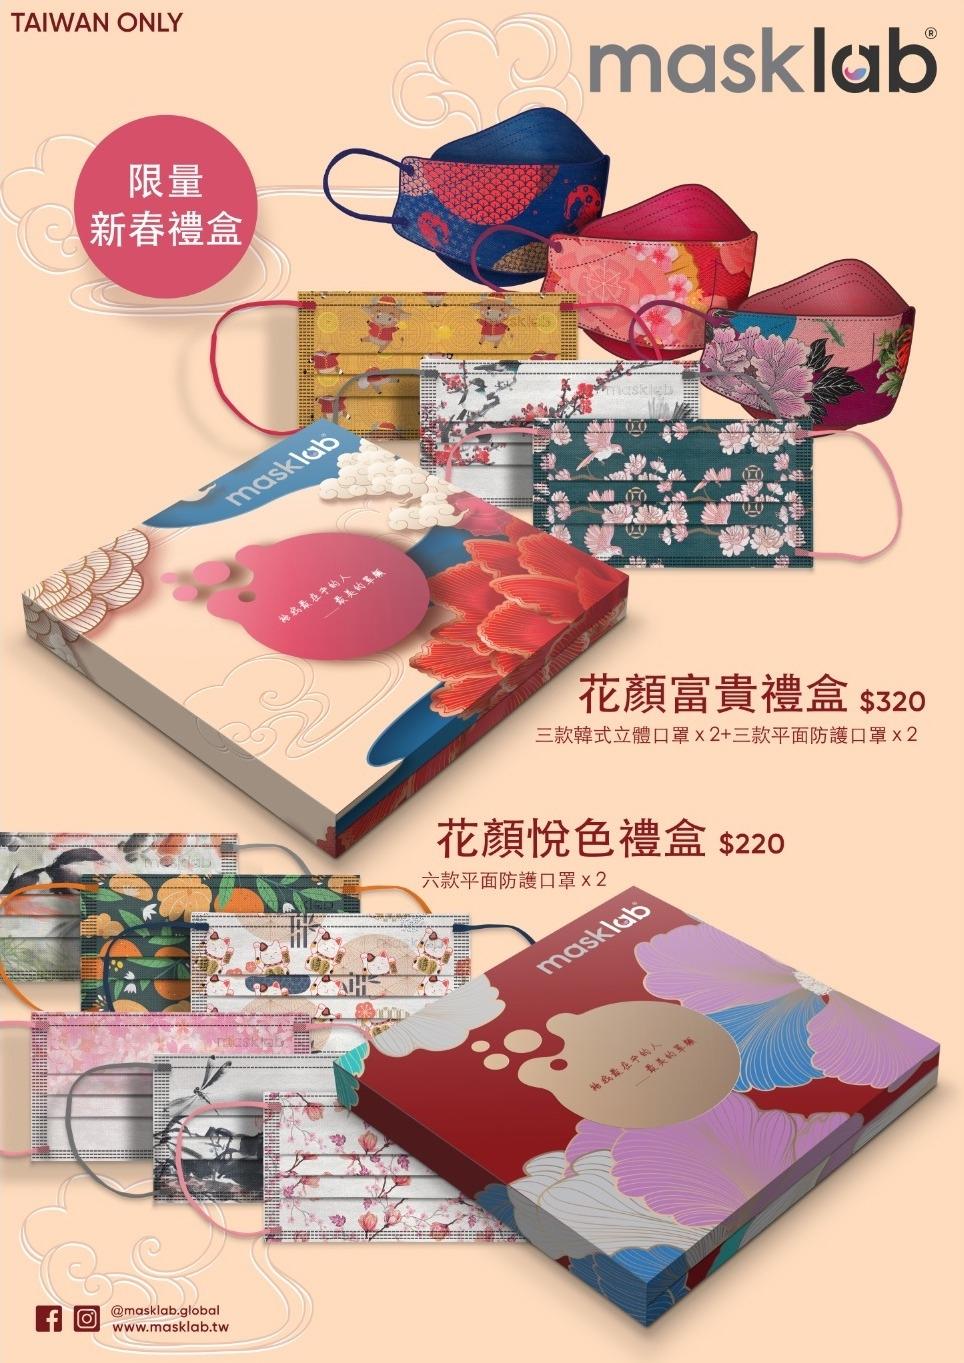 masklab登陸台灣獨賣新春限量禮盒 漸層櫻花、水墨金魚、招財貓必收款 !